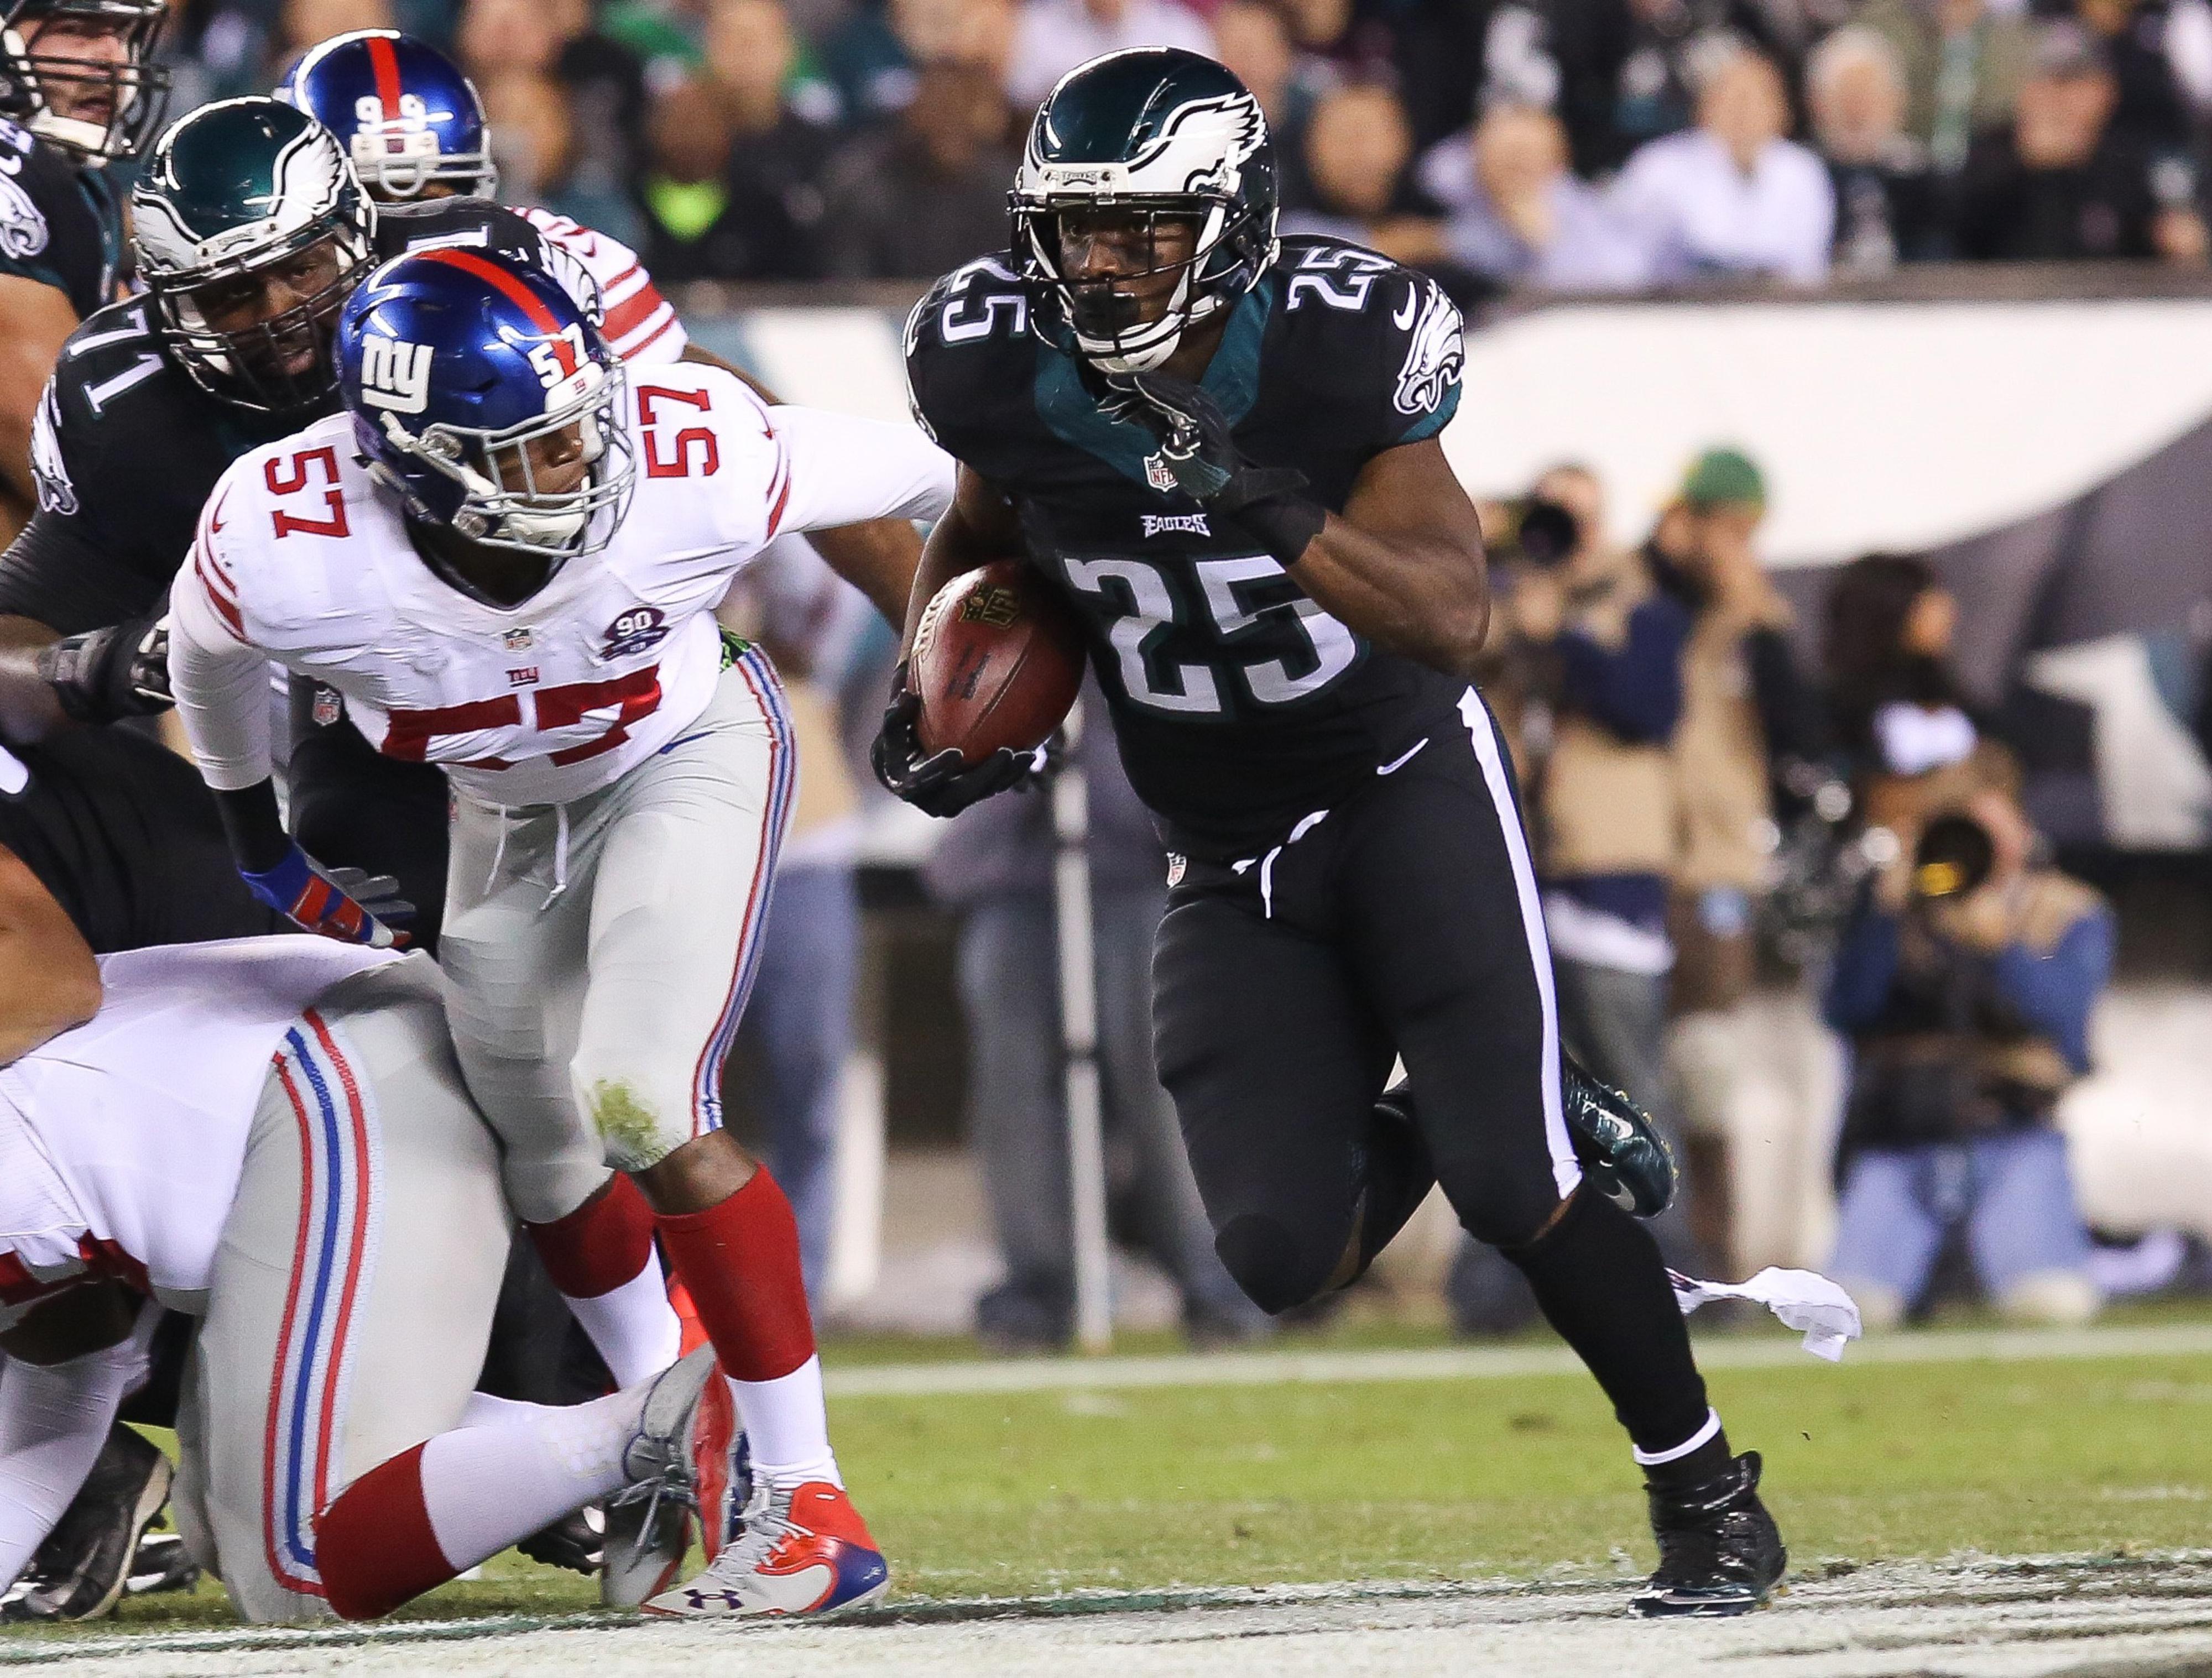 LeSean McCoy ran wild vs. the Giants. Will DeMarco Murray do the same?